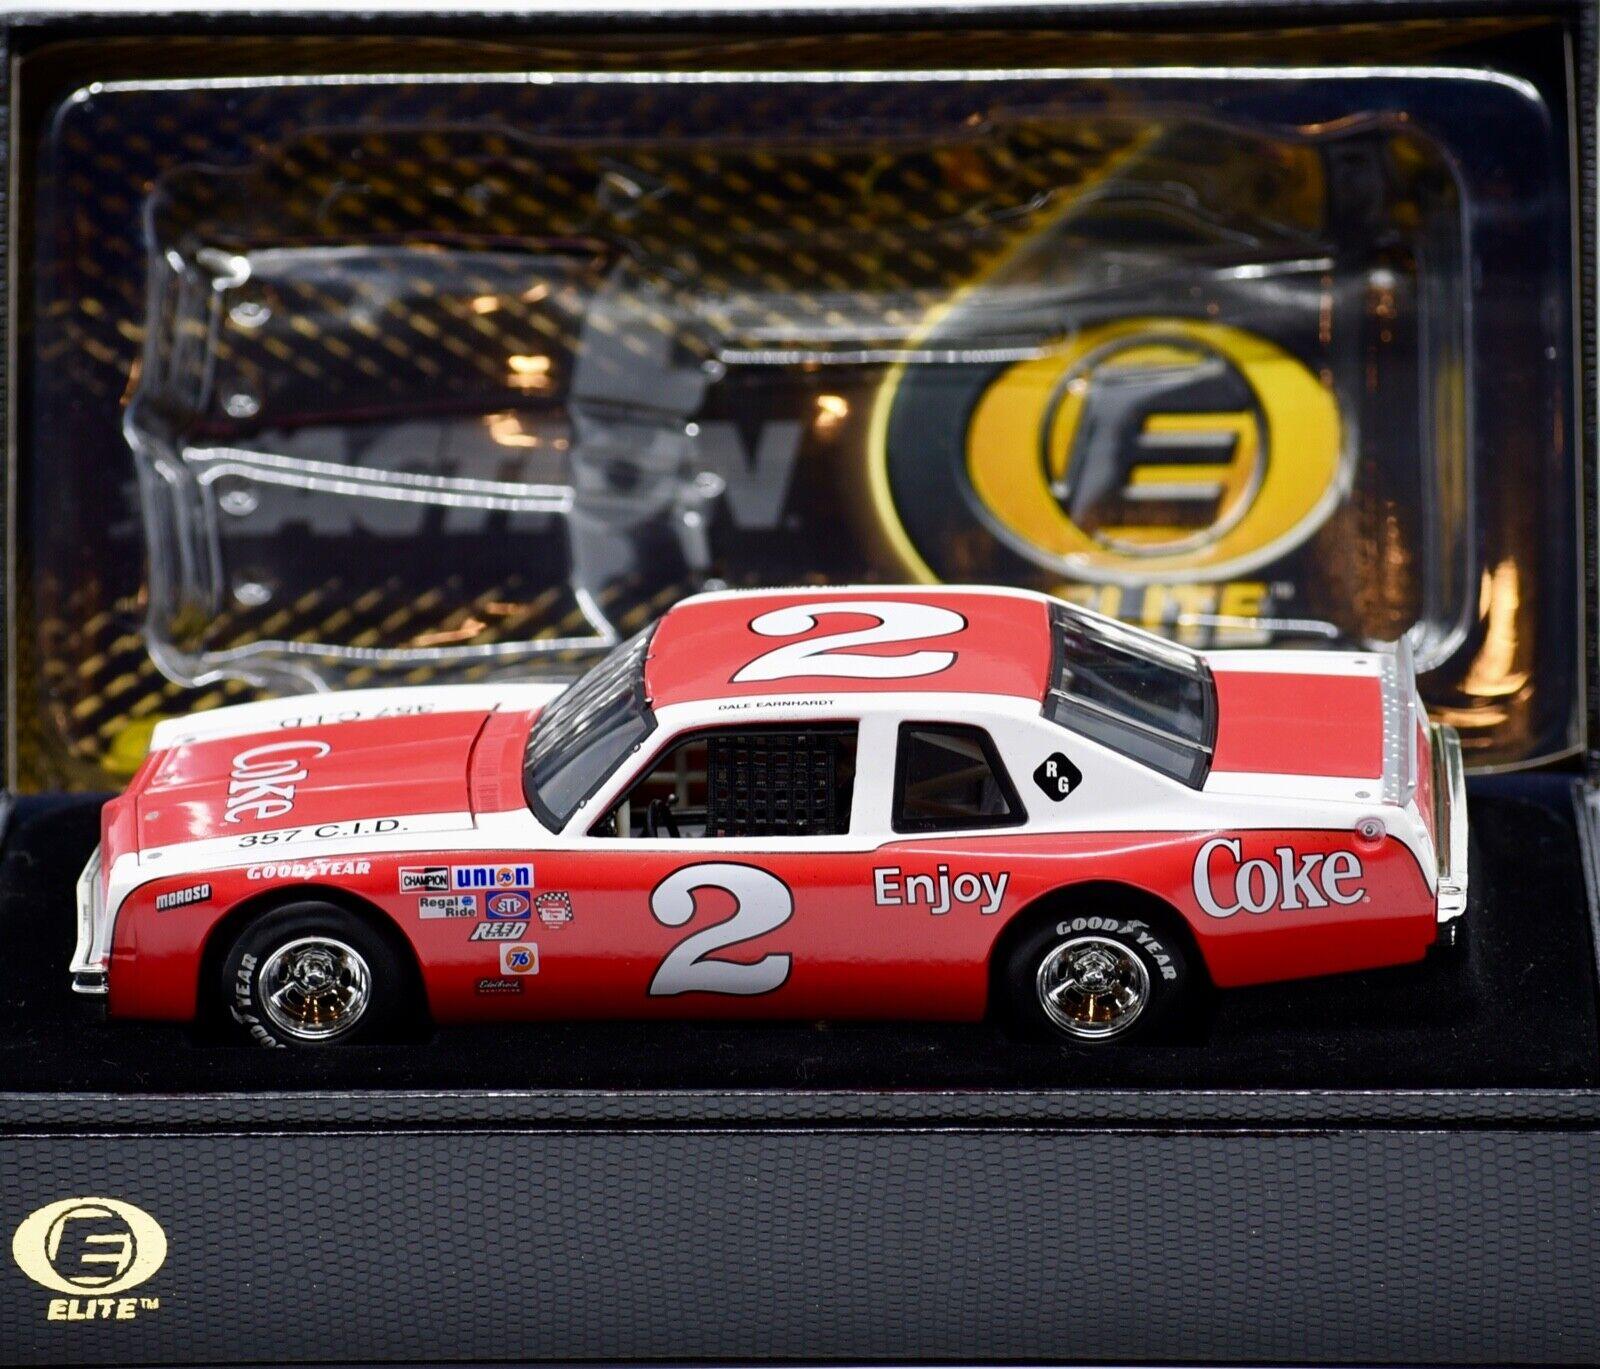 2002 verkan Elite Dale Earnhardt Coke 1980 Pontiac Ventura of 504 Sällsynt